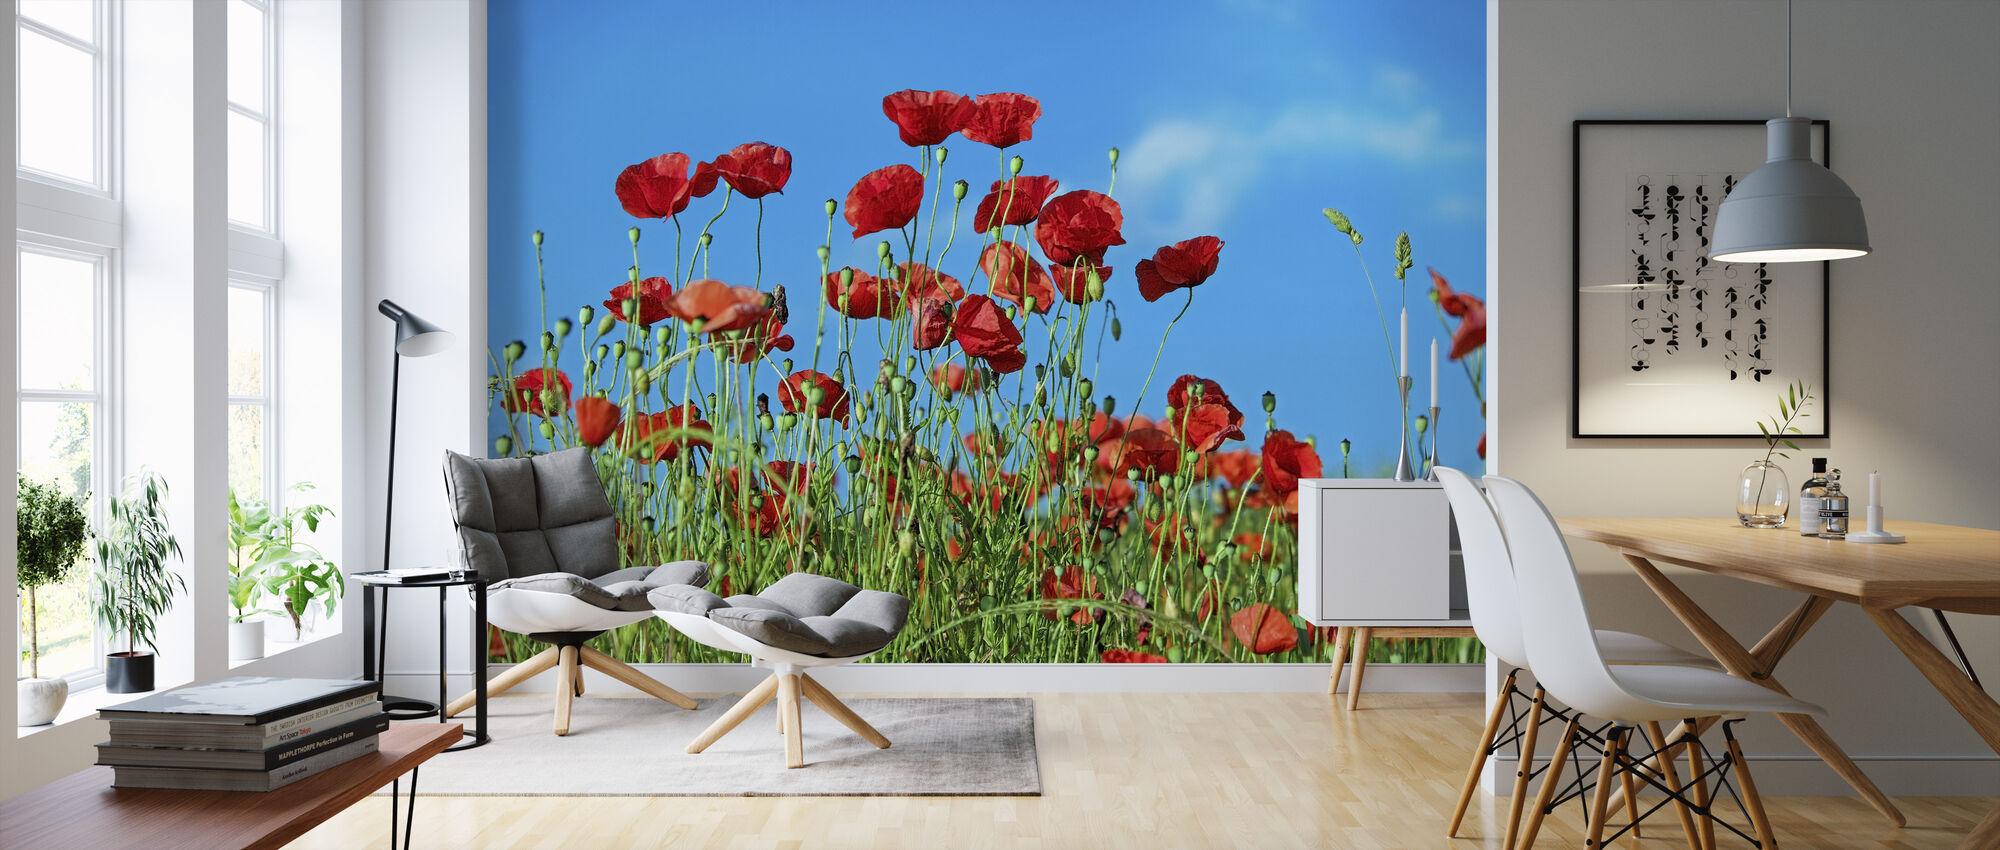 Field of Poppies - Wallpaper - Living Room